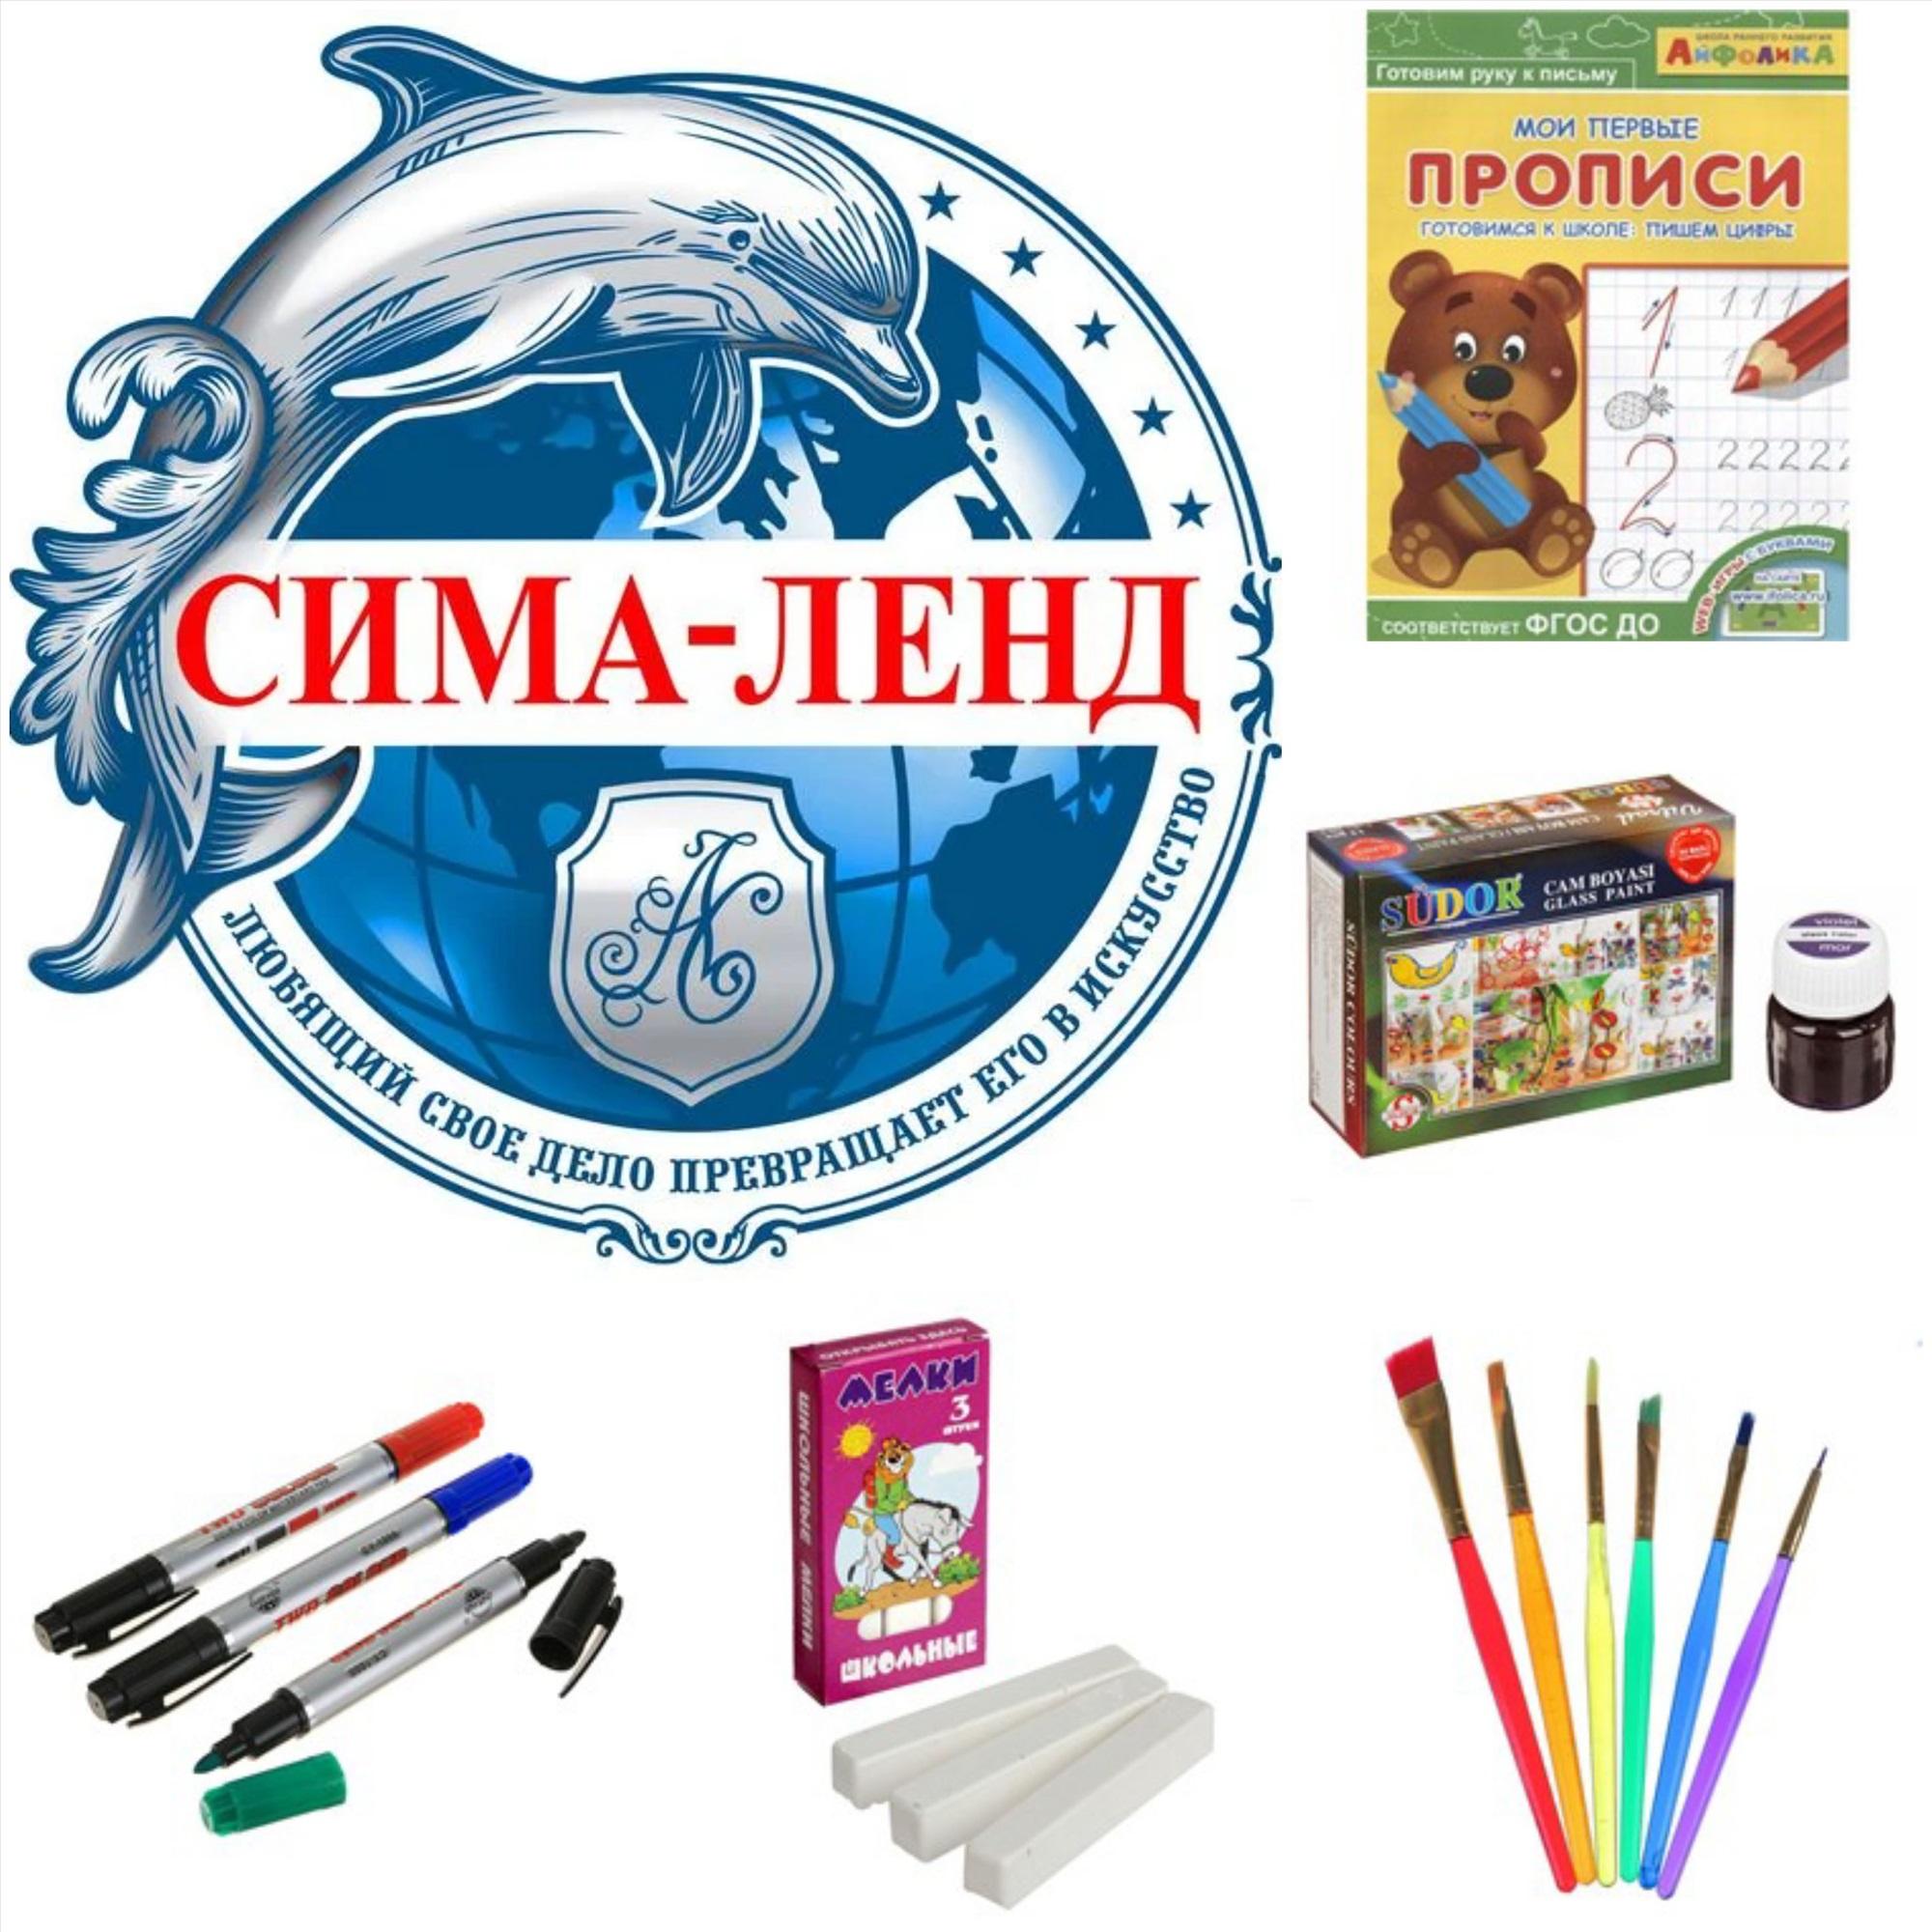 сималенд ру каталог товаров для творчества